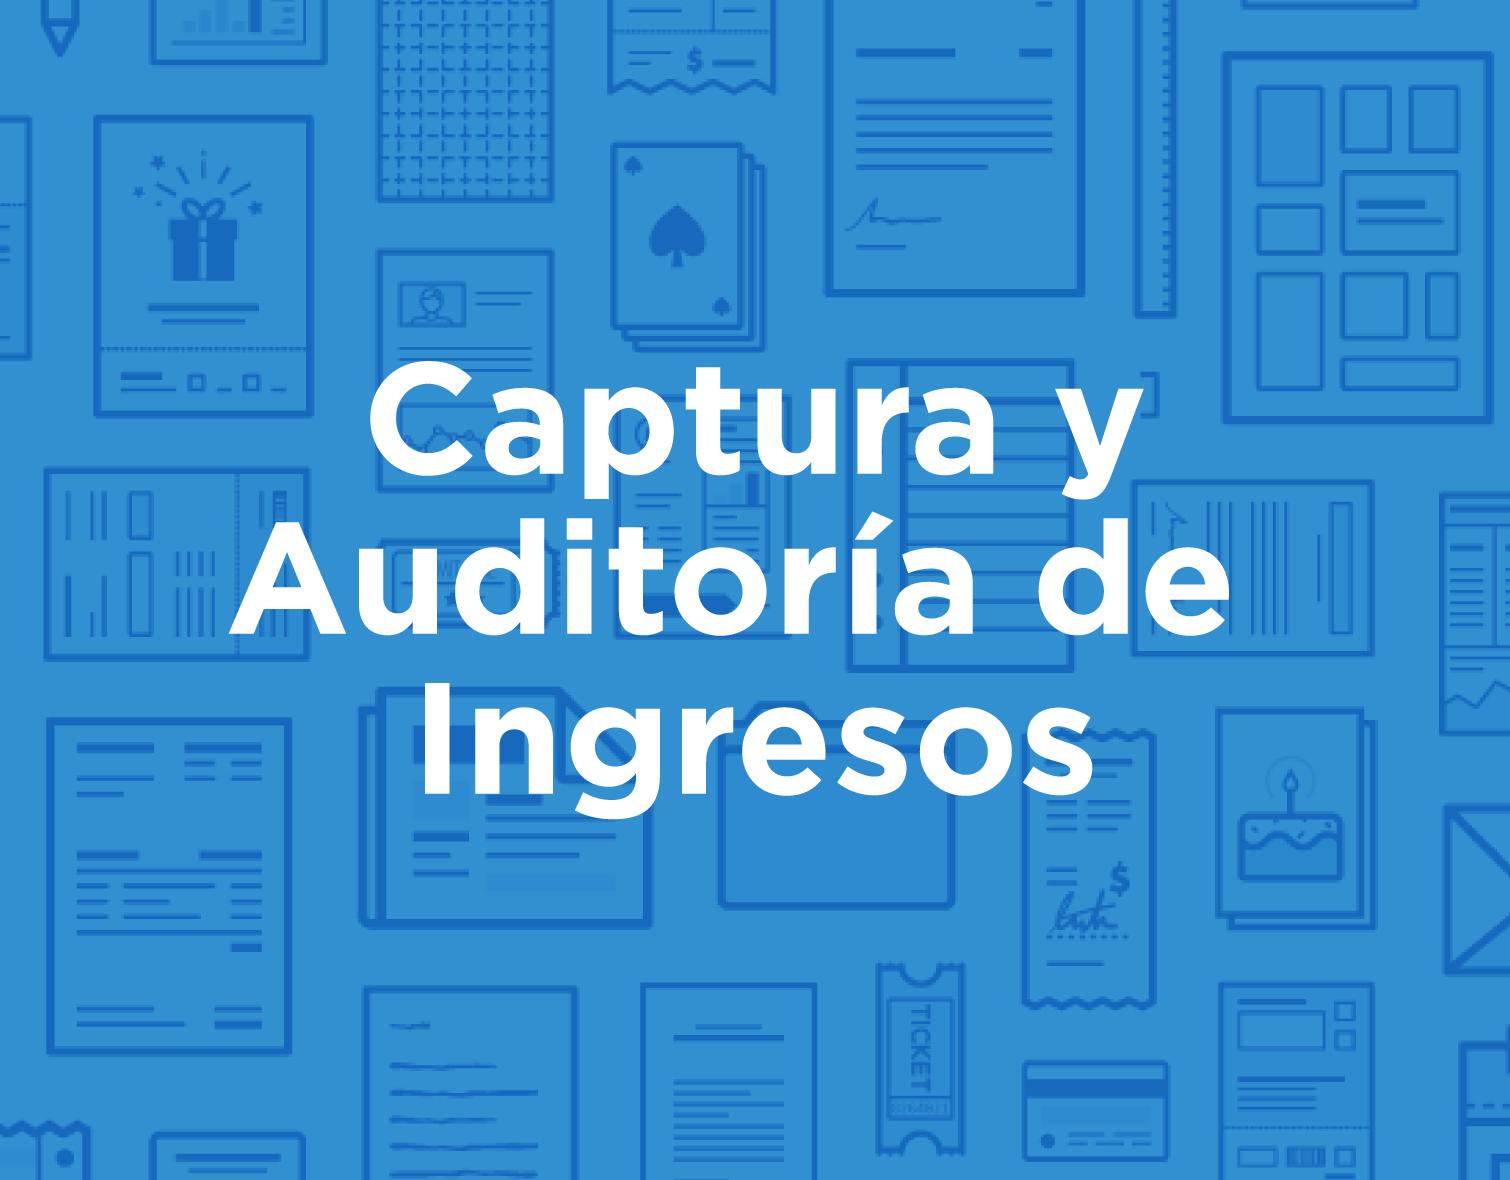 icon_products_spa_Captura-Auditoria-Ingresos.jpg